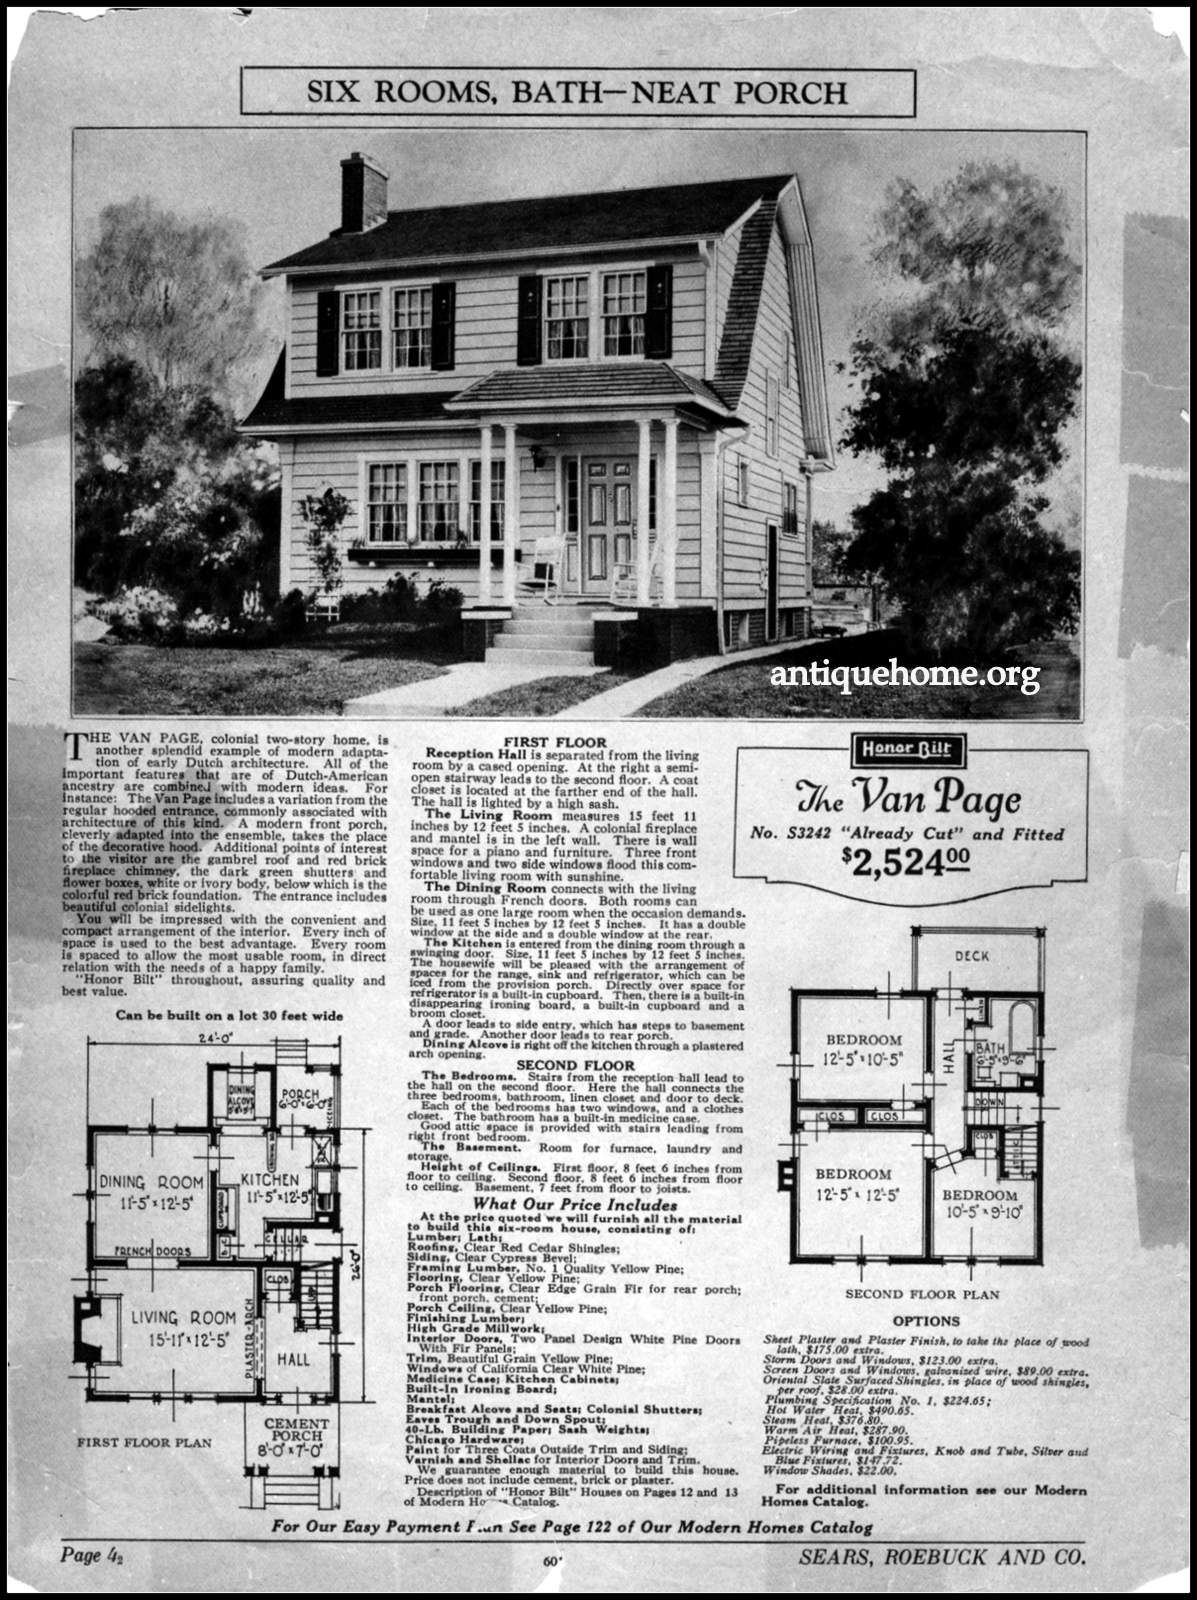 Sears Honor Bilt House The Van Page Vintage House Plans Sears Kit Homes